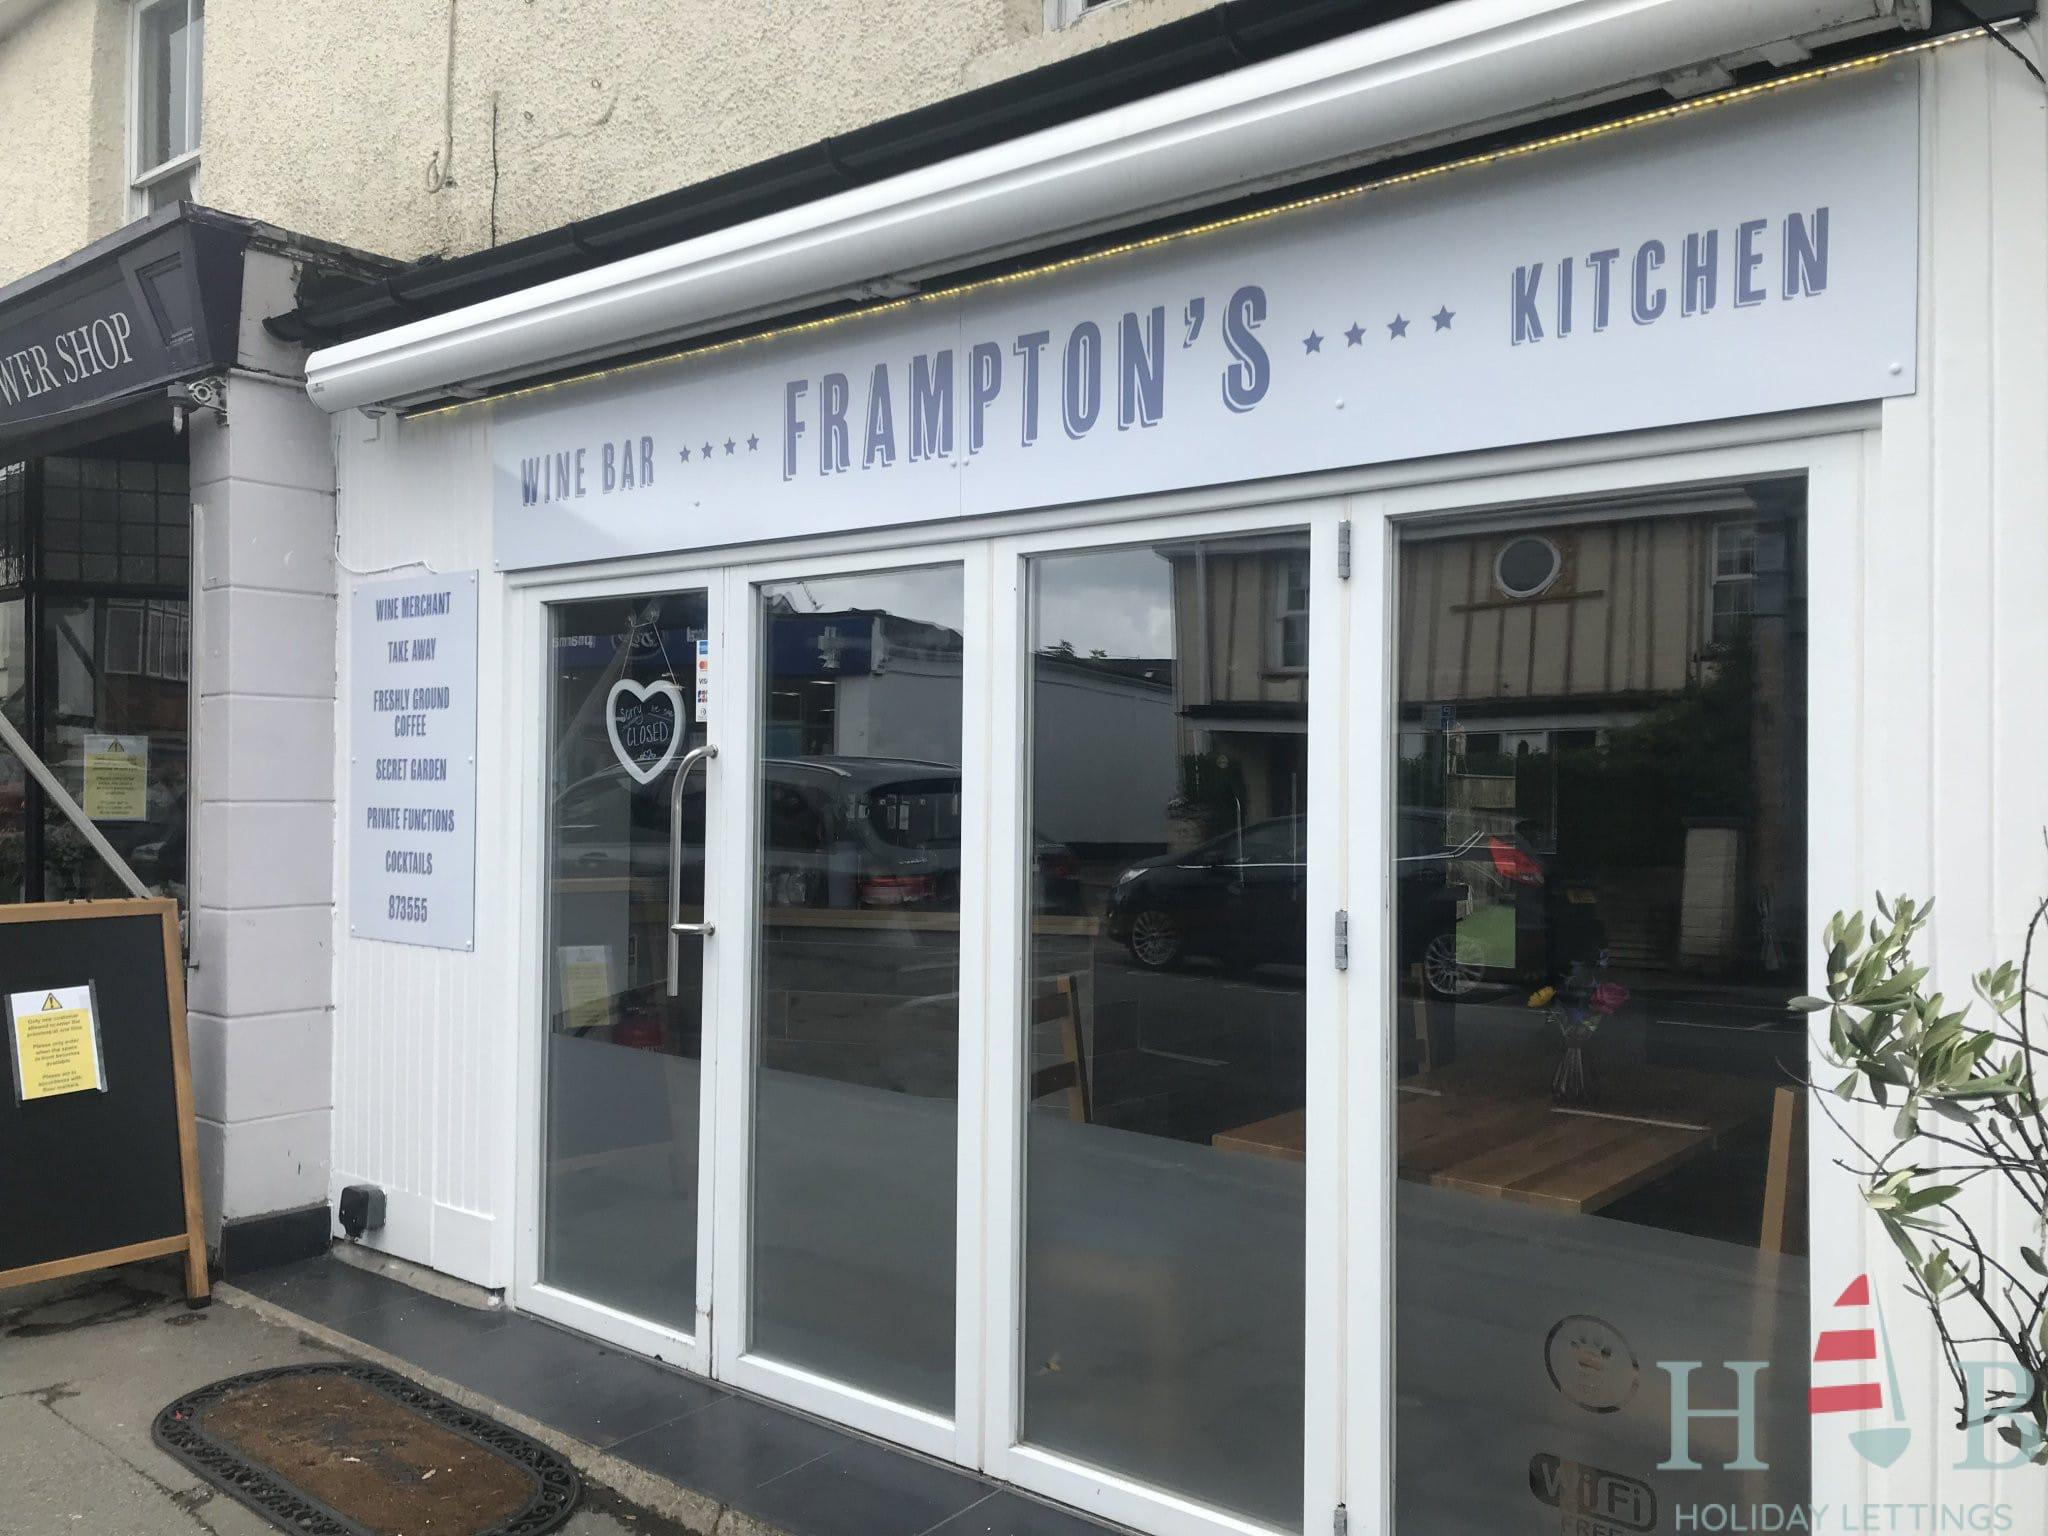 Frampton's